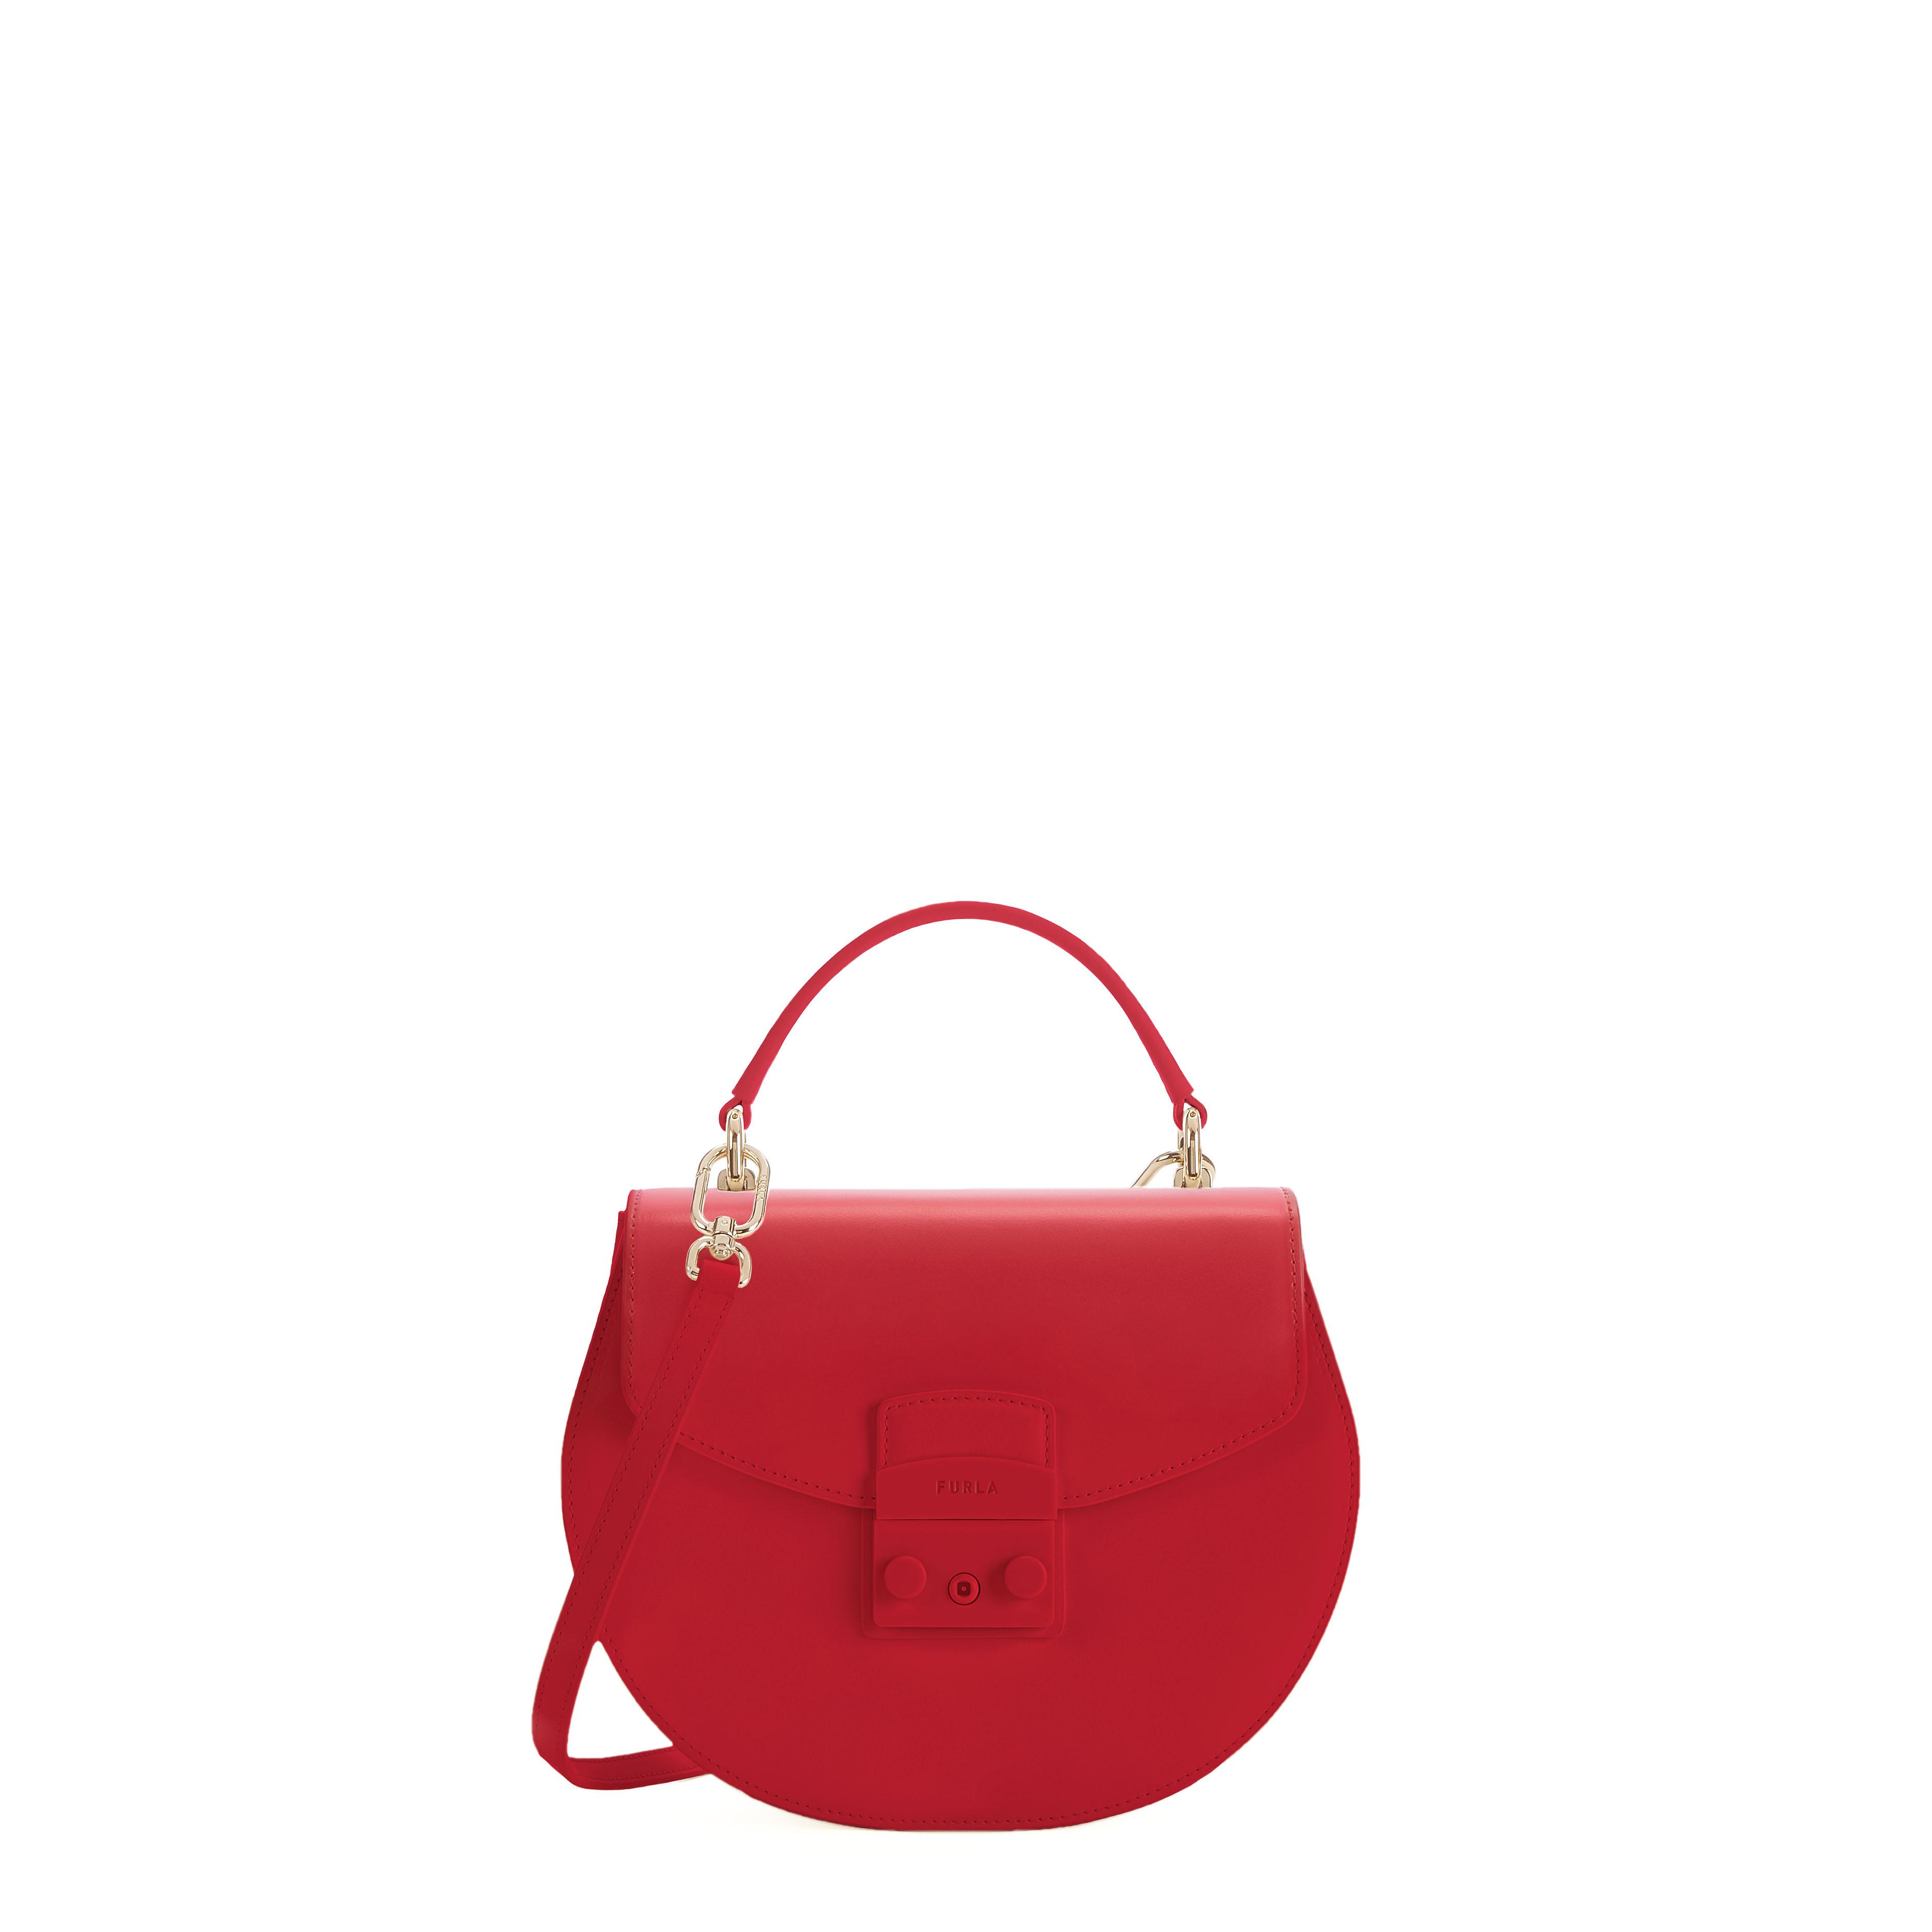 Furla's new rounded Metropolis handbag.